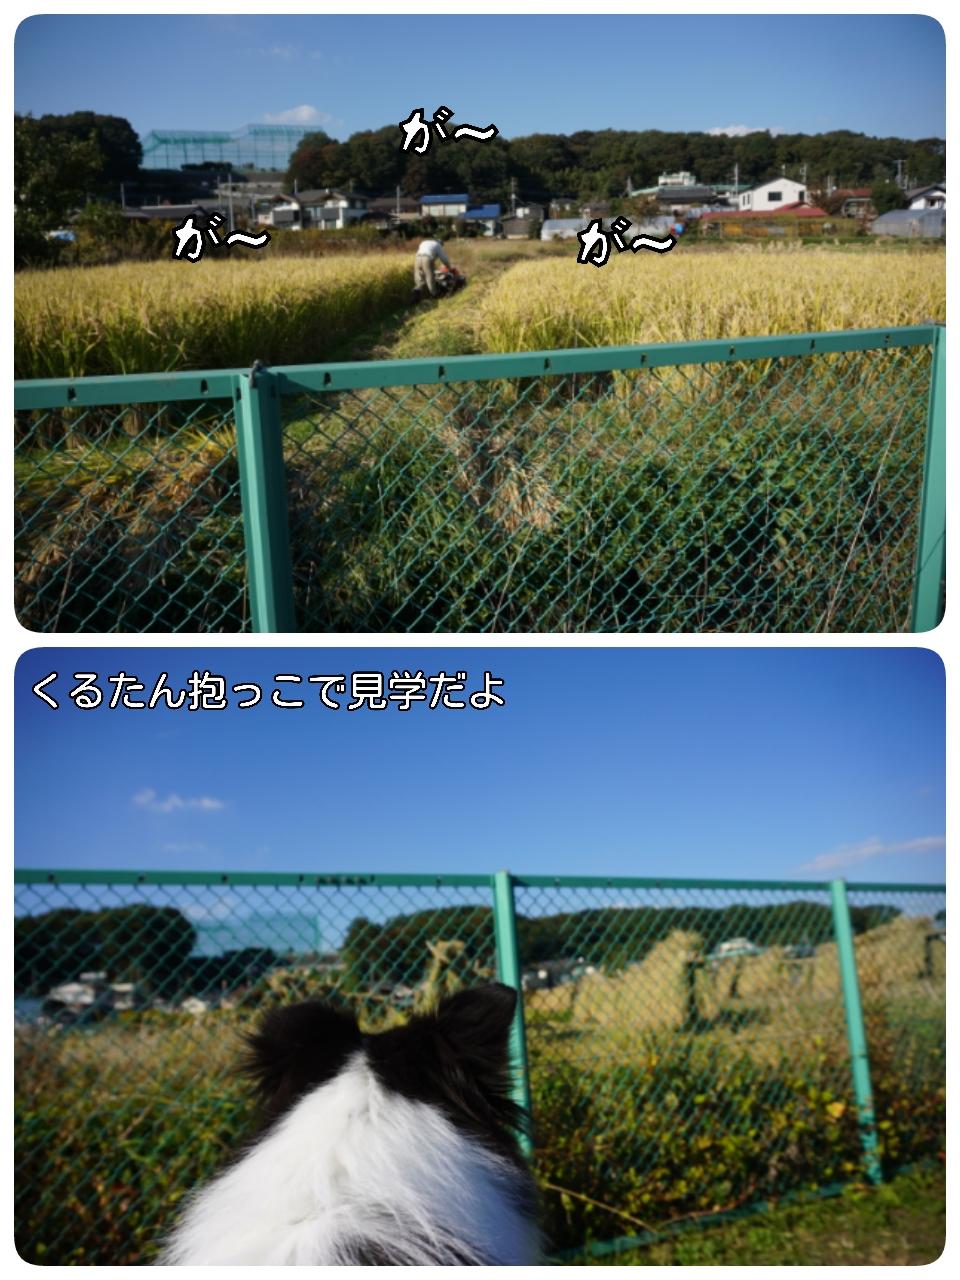 15-11-06-14-17-12-508_deco.jpg